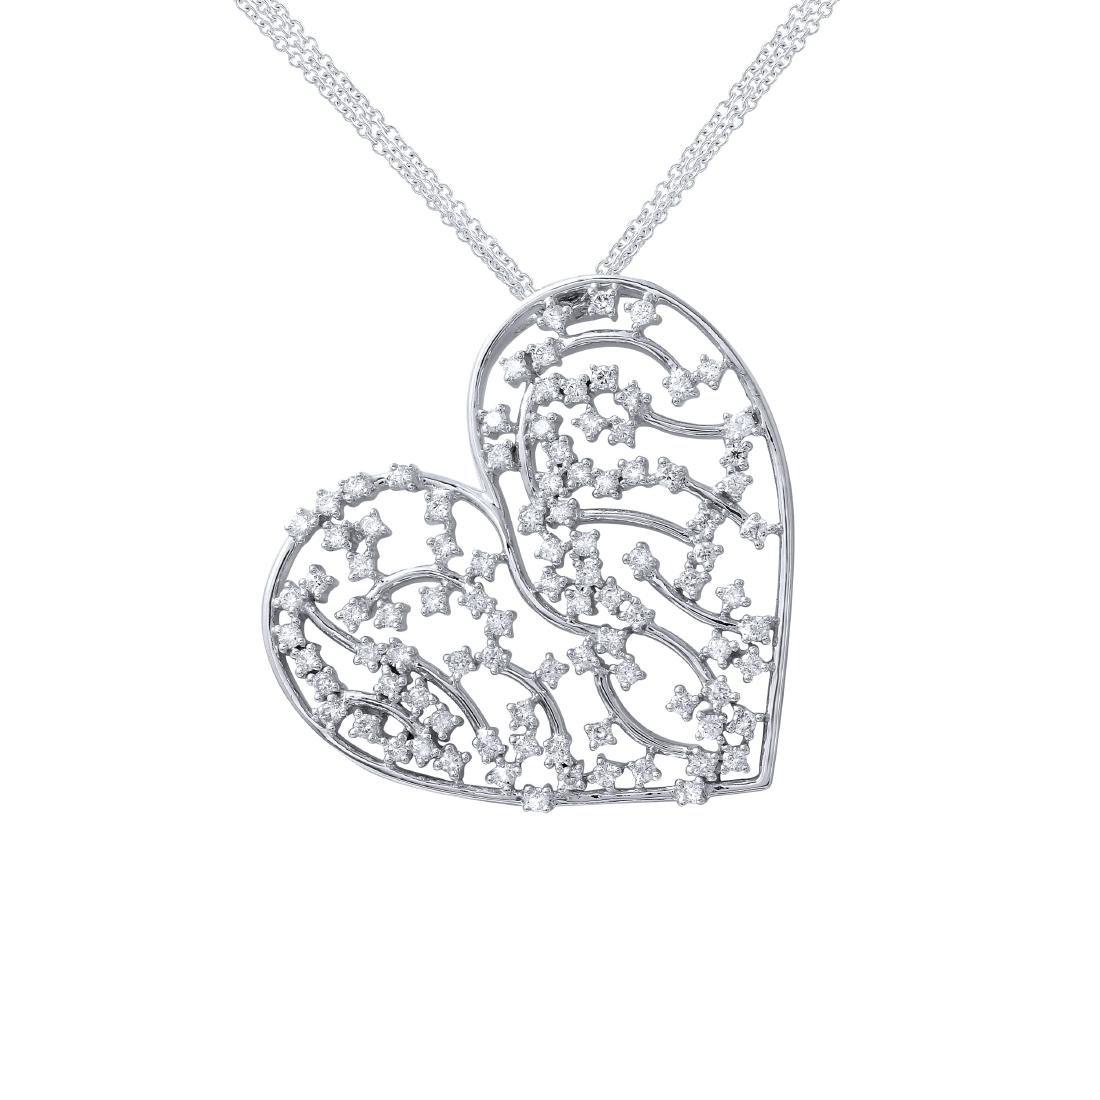 18KT White Gold Ladies Slider with Chain